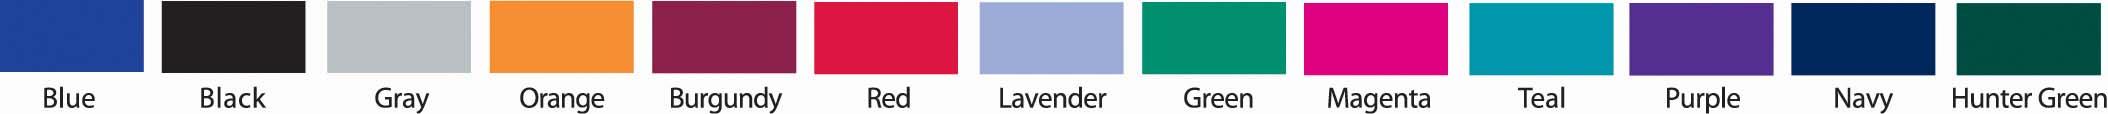 spectrum-dual-head-stethoscope-adult-boxed-lavender-10-426-110-lr-2.jpg